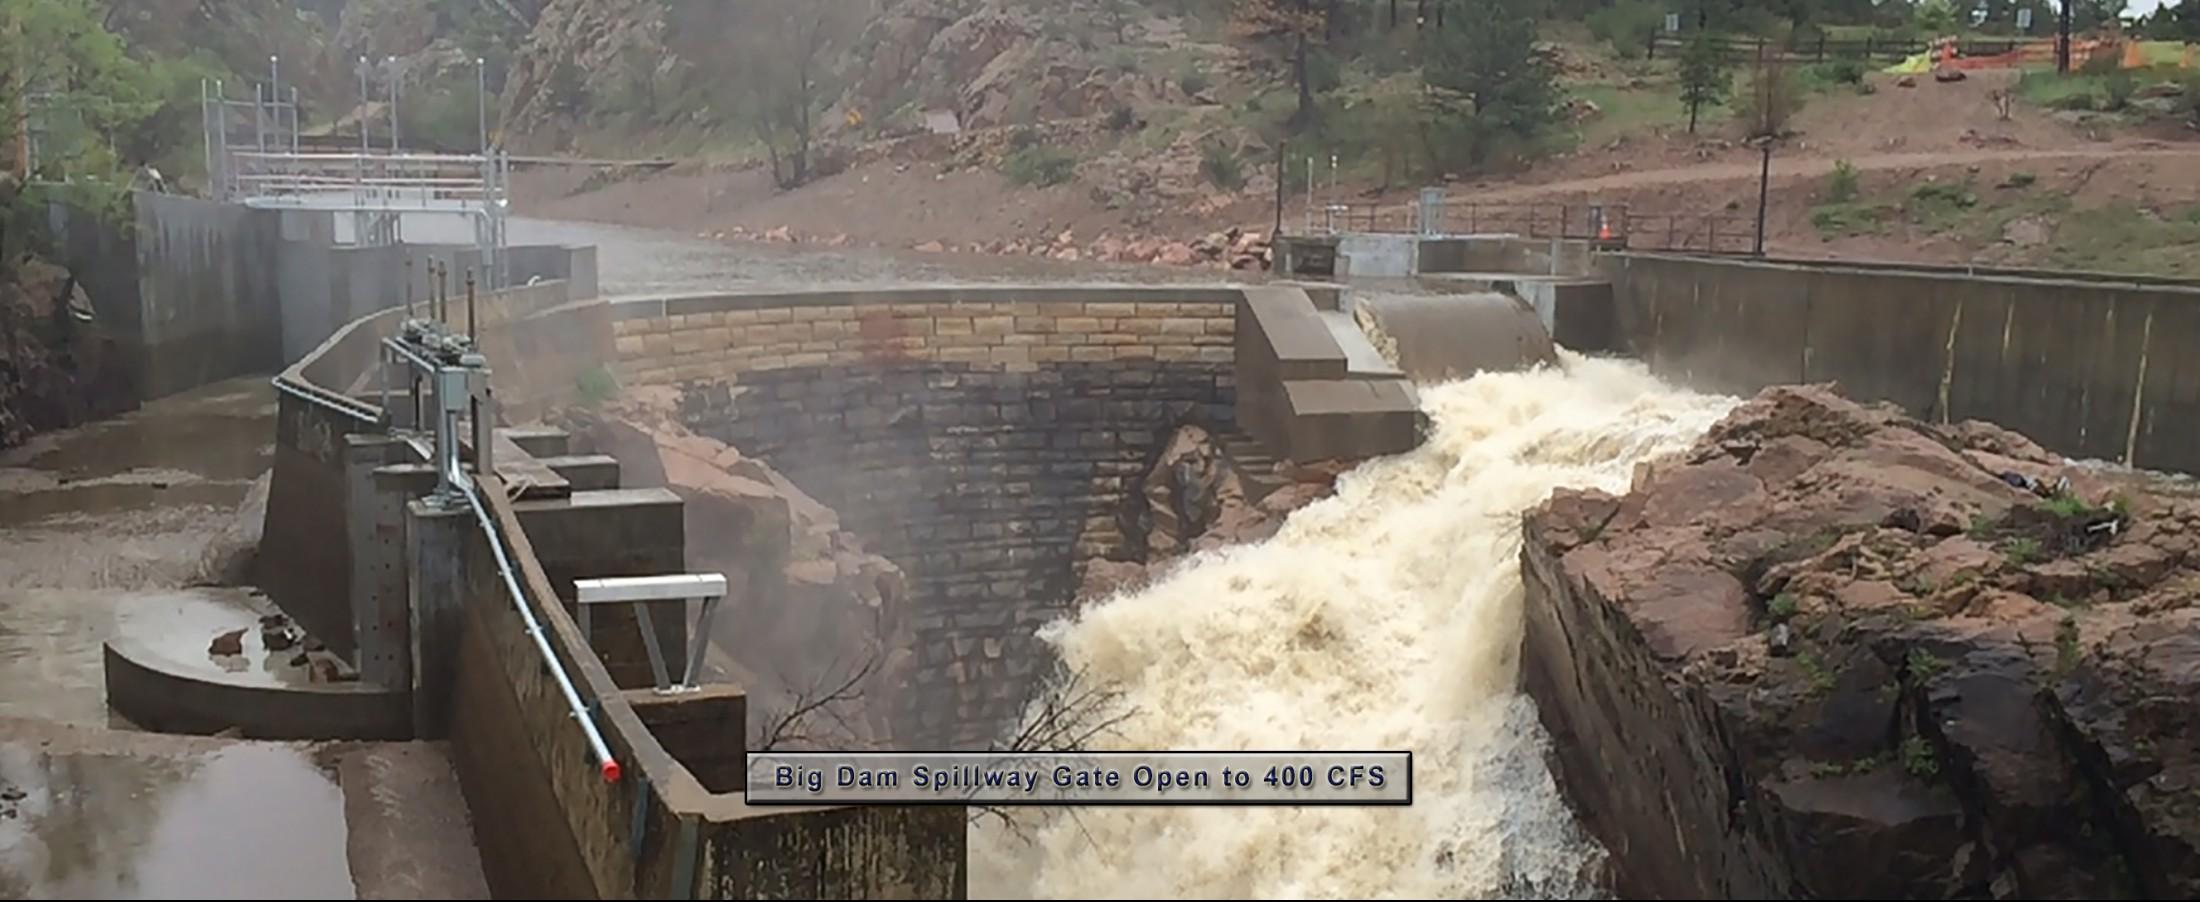 Big Dam Spillway Gate